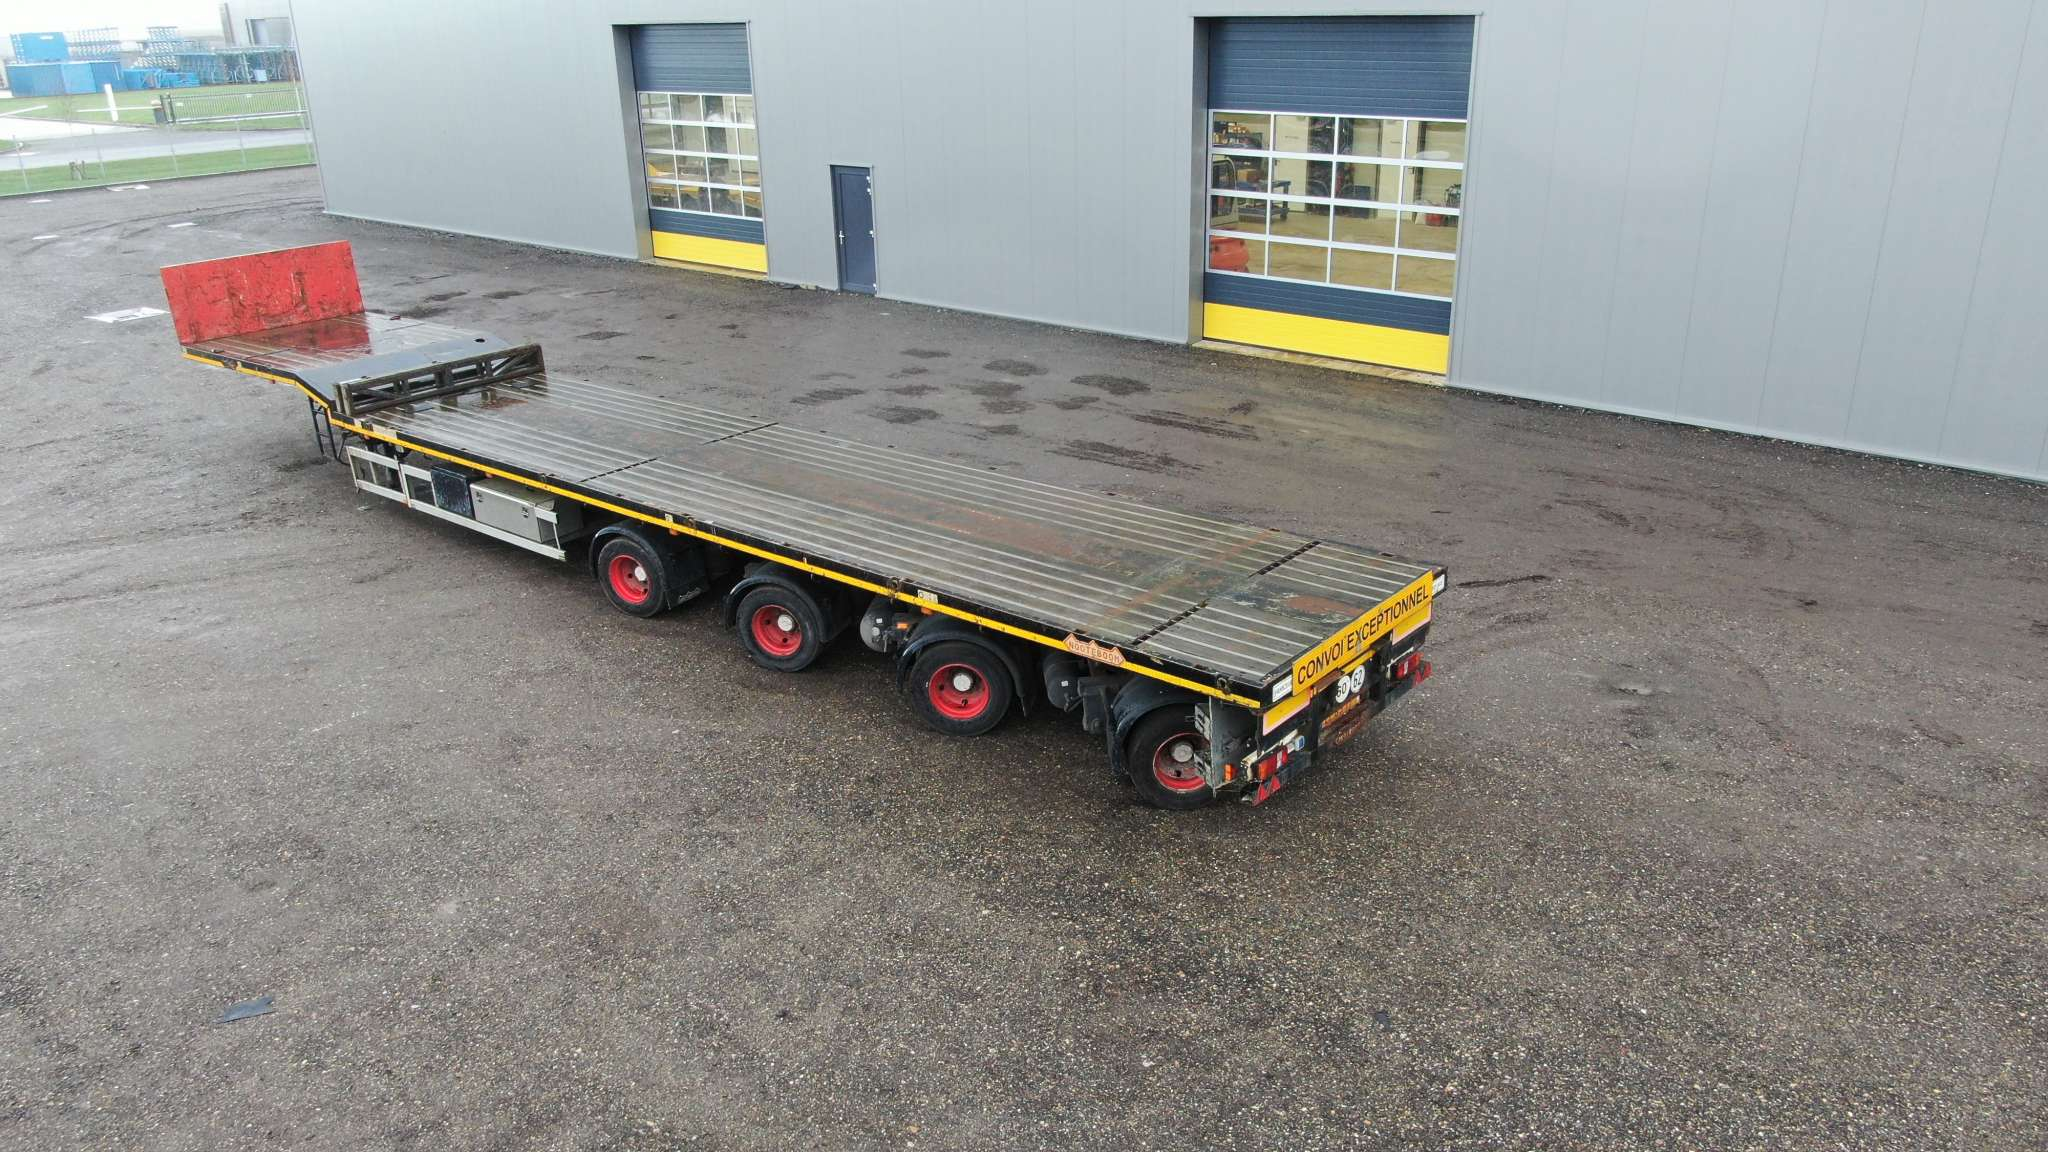 4 Ejes de cama plana | 3x extensible hasta 48 m | carga útil 47 toneladas